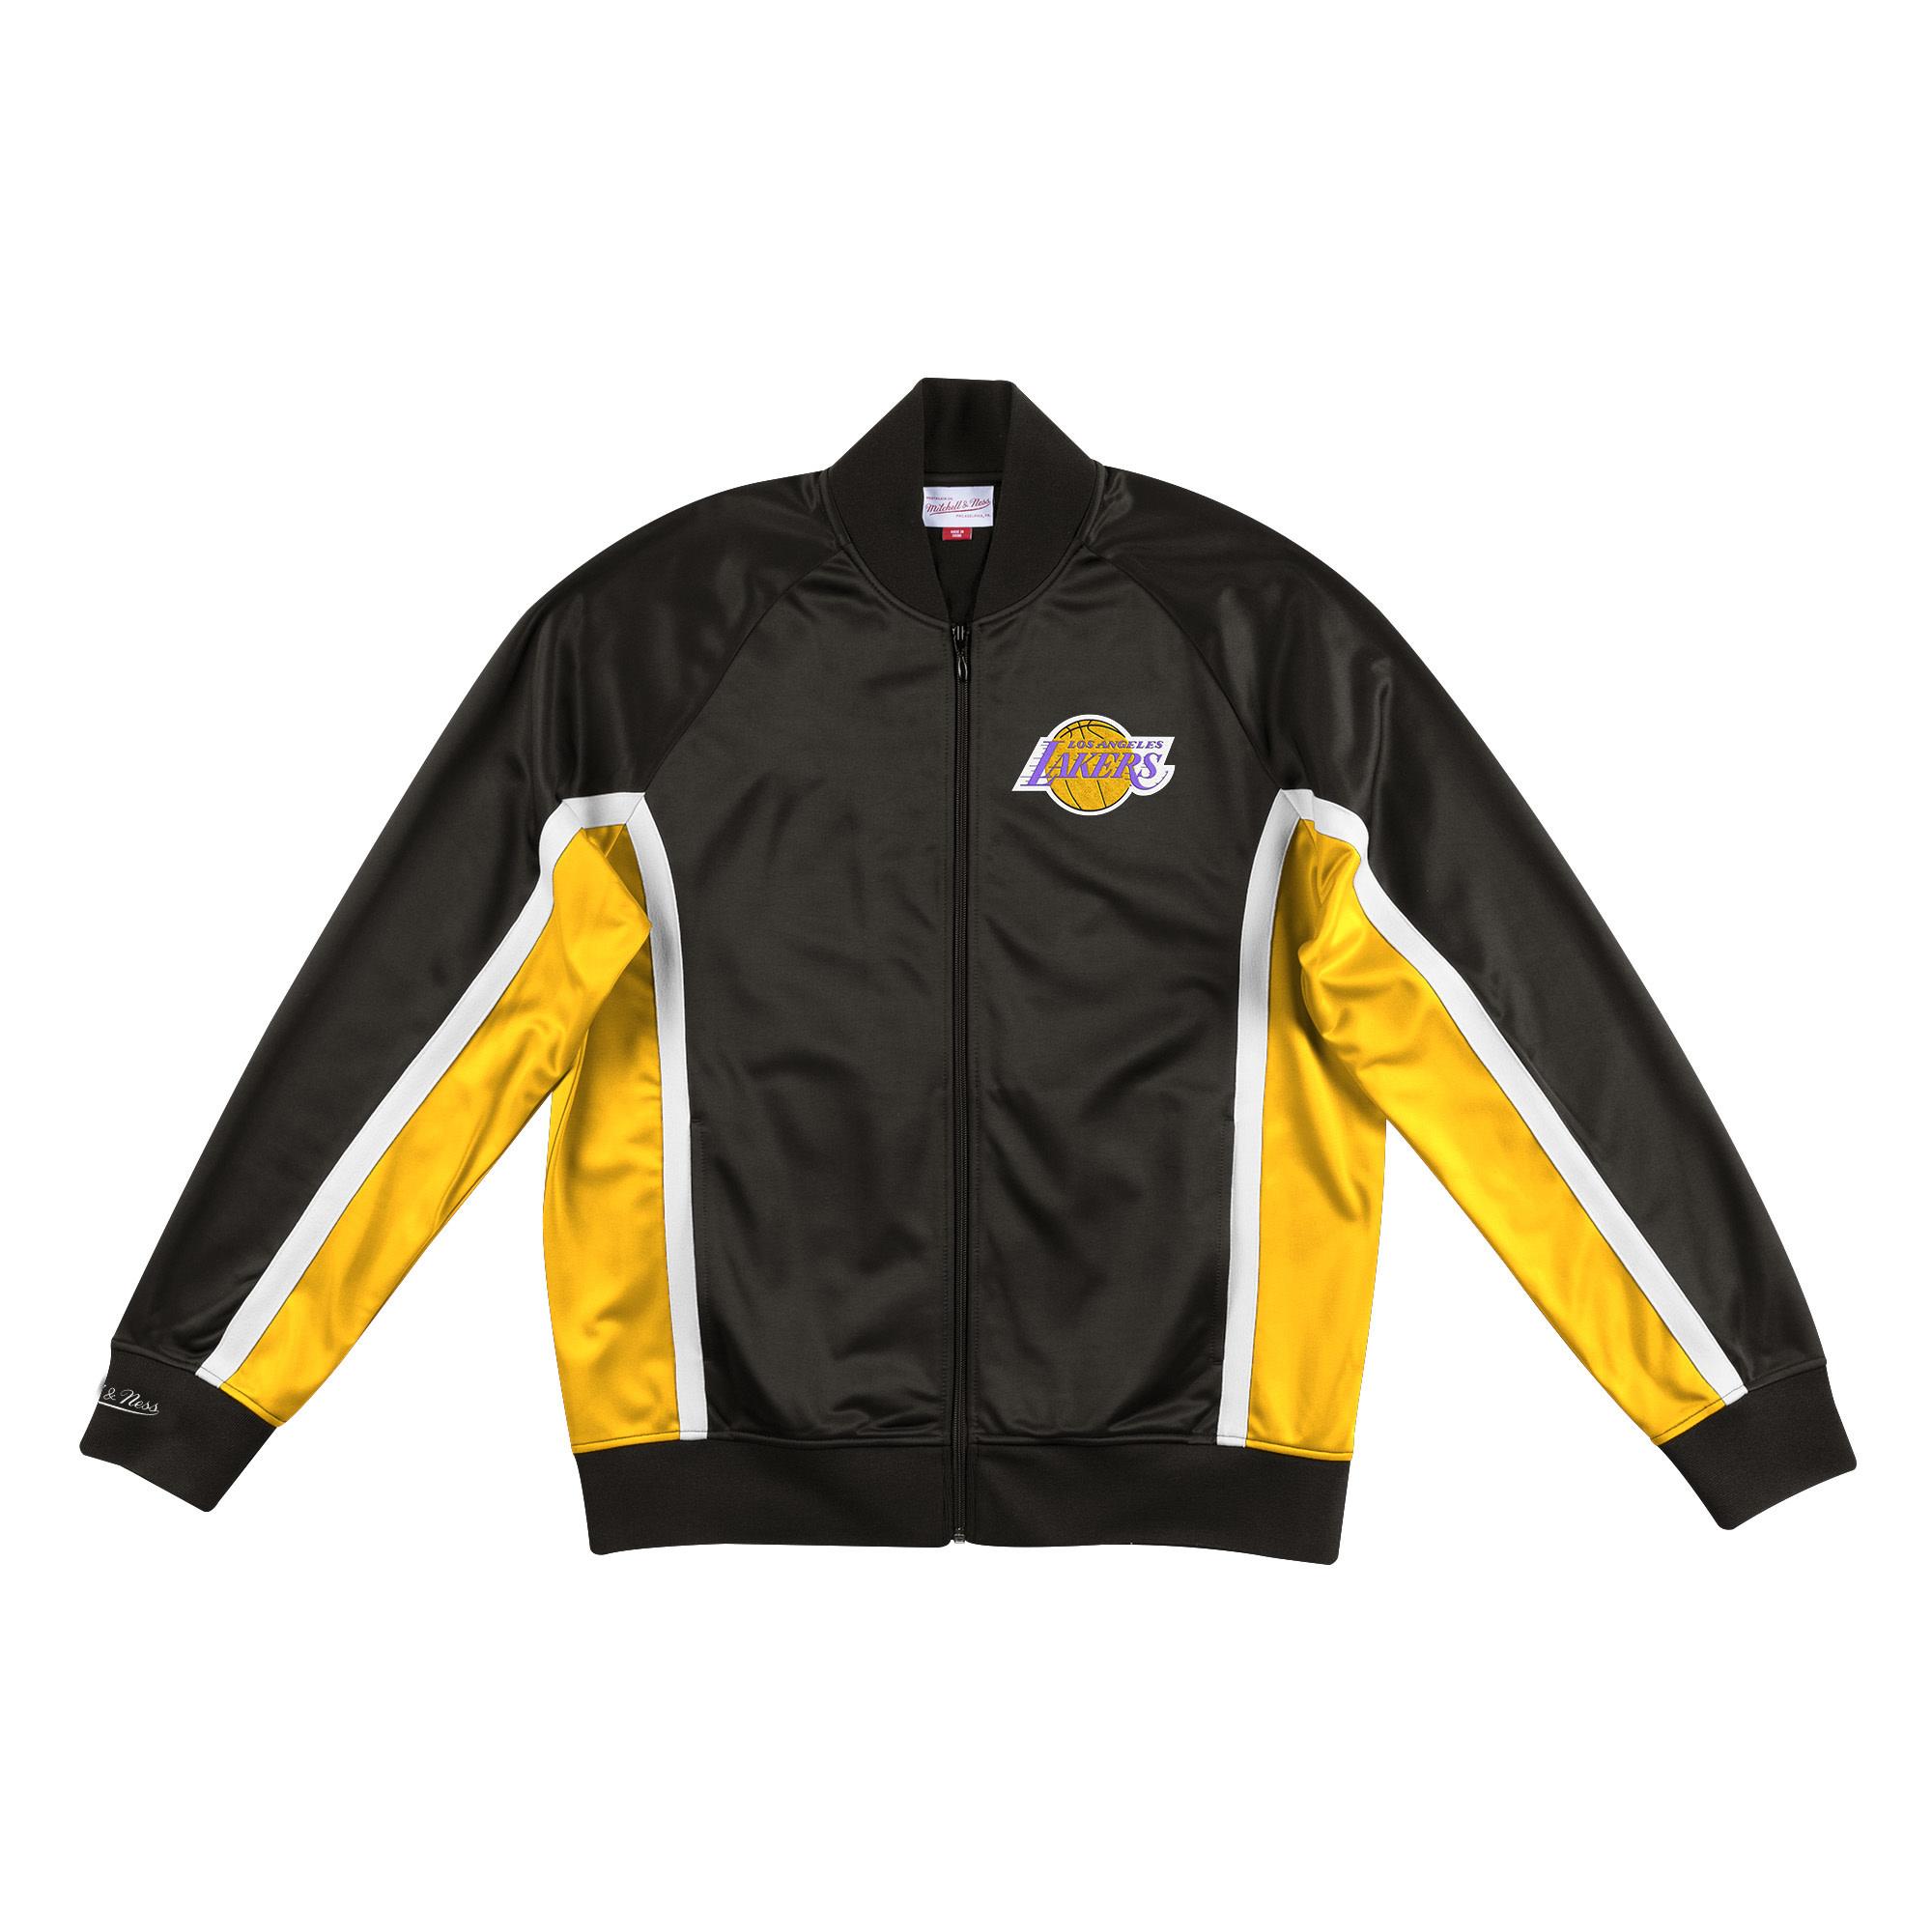 La Lakers Mitchell Ness 20 Men S Championship Game Track Jacket Black The Locker Room Of Downey